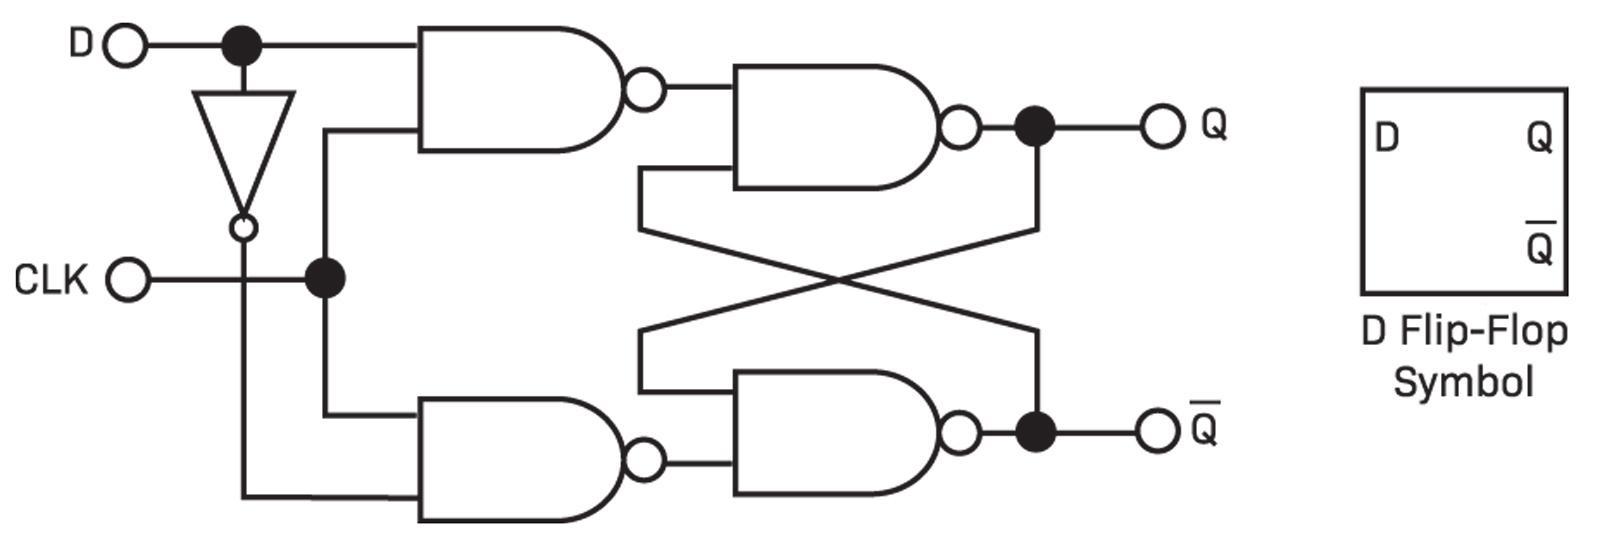 Type Flipflop Timing Diagram